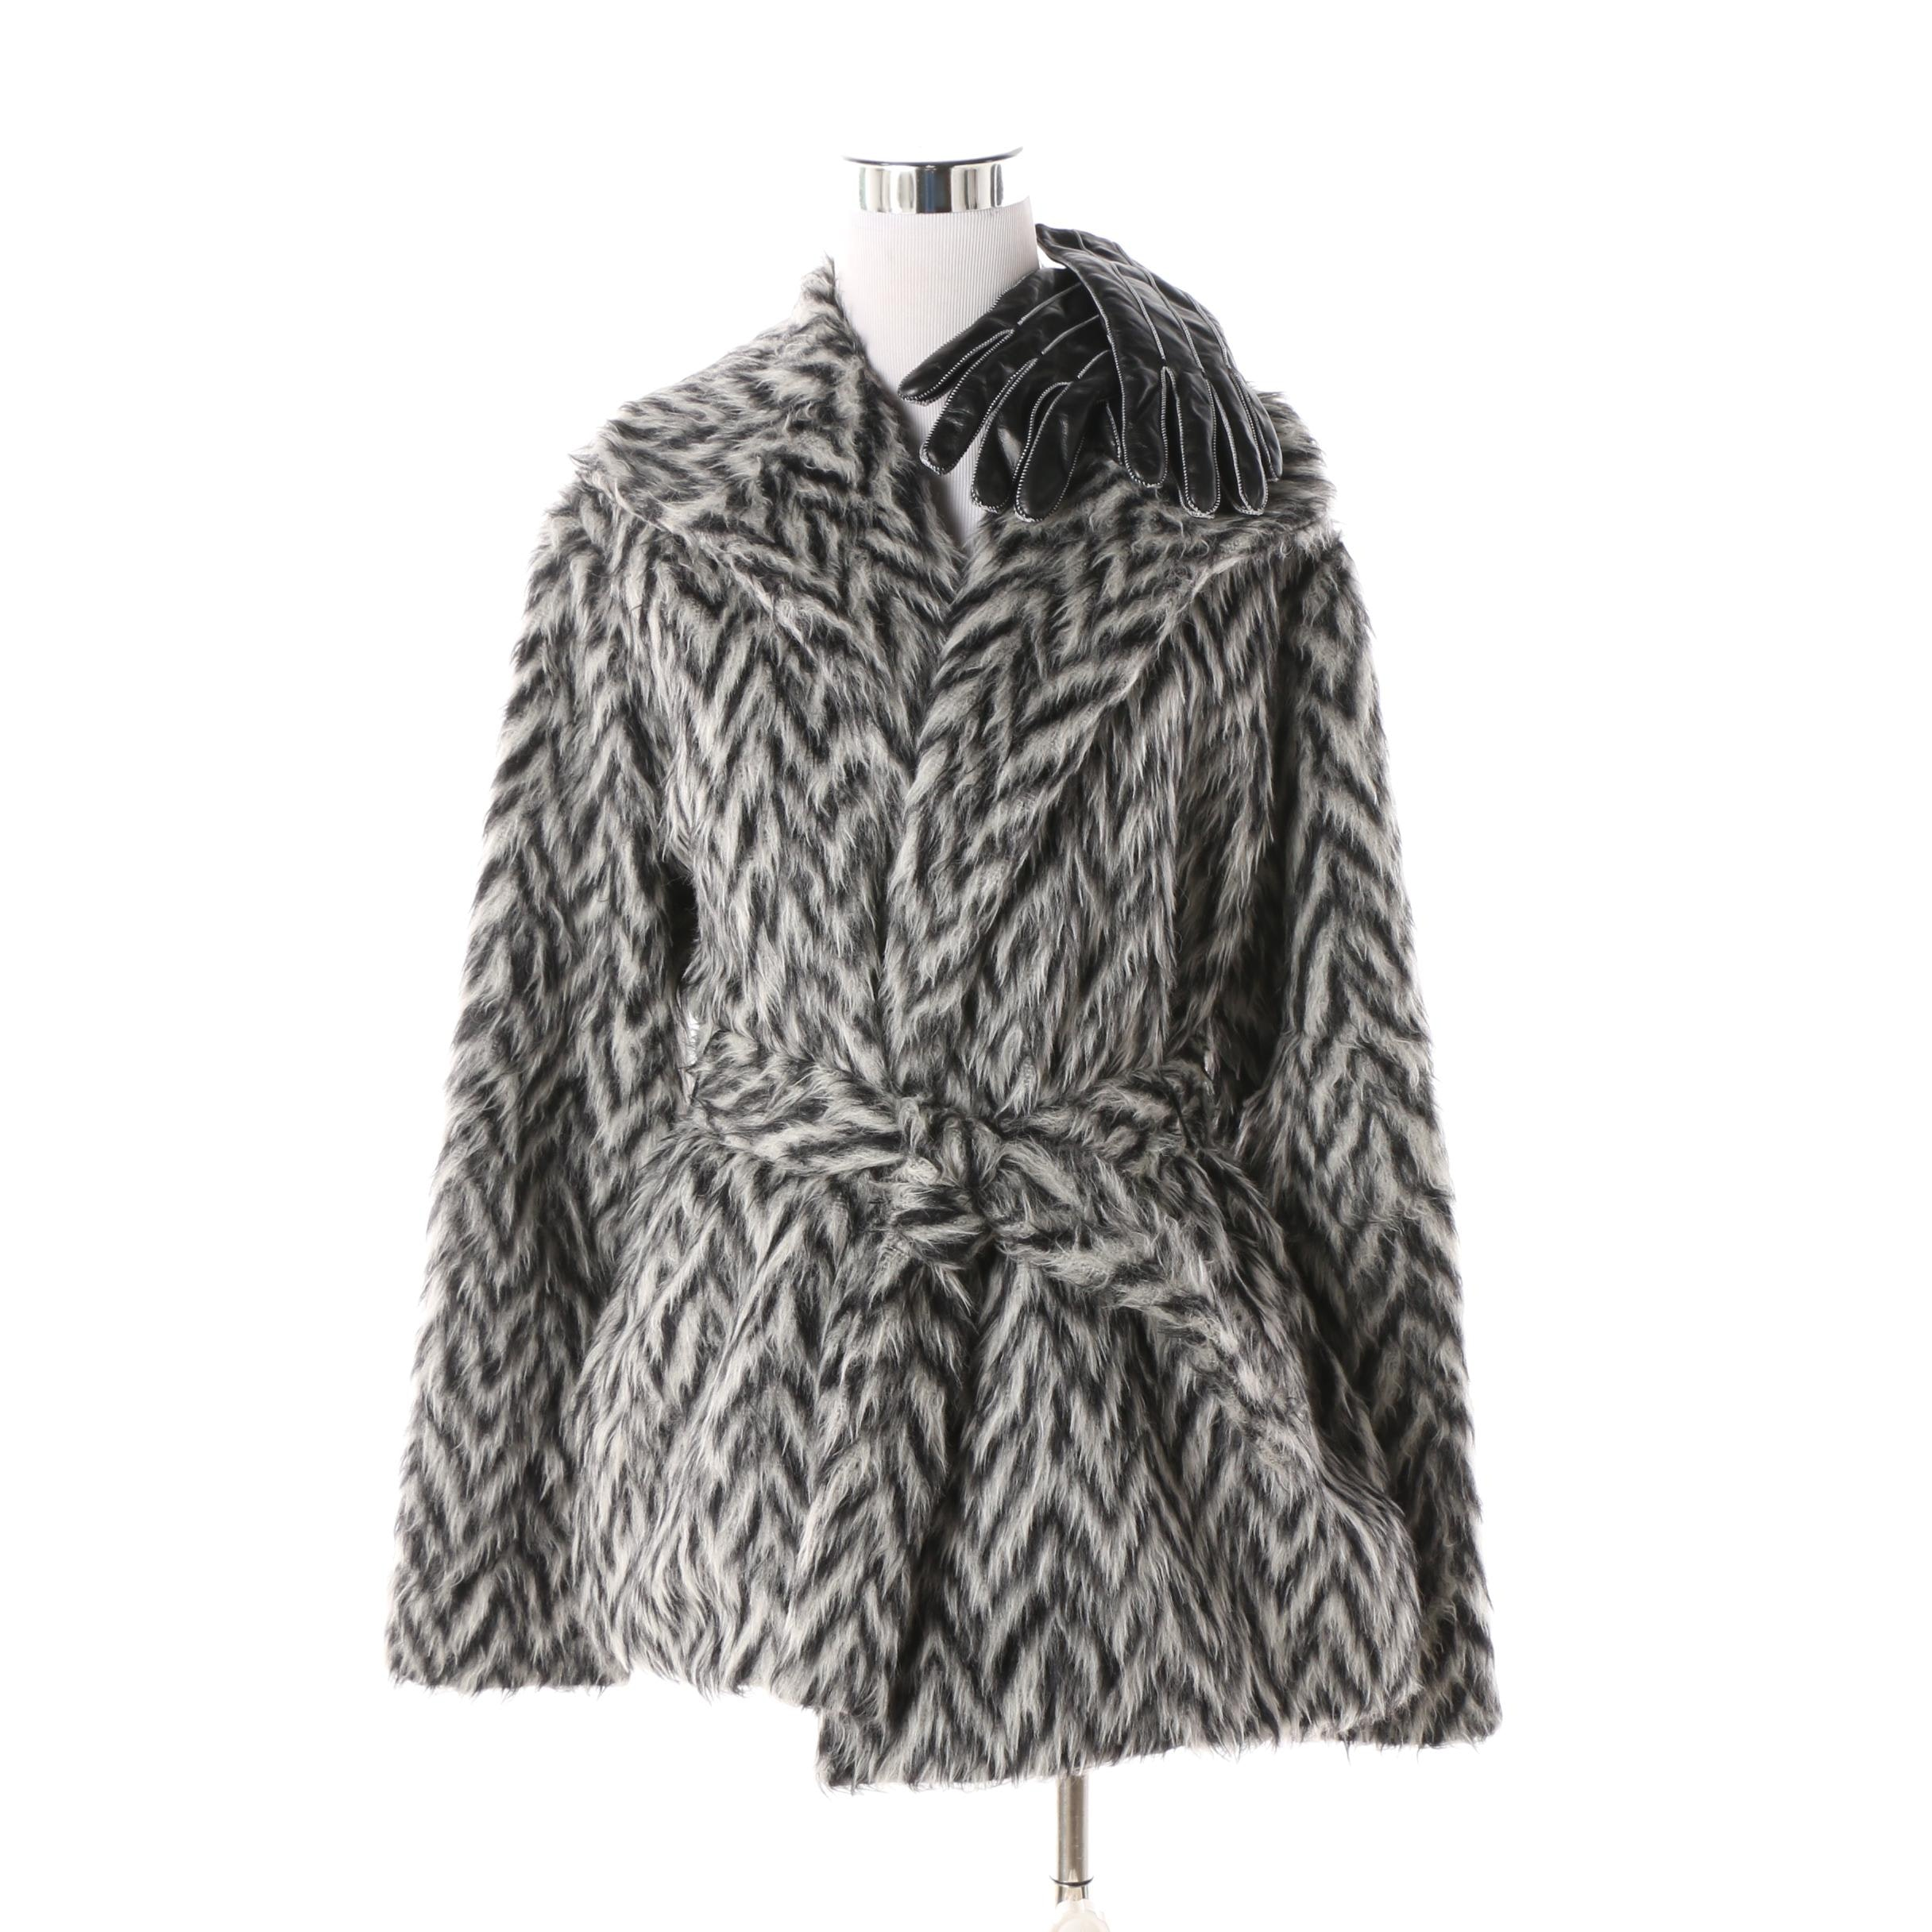 Women's Missoni Alpaca Blend Herringbone Knit Sweater with Leather Gloves